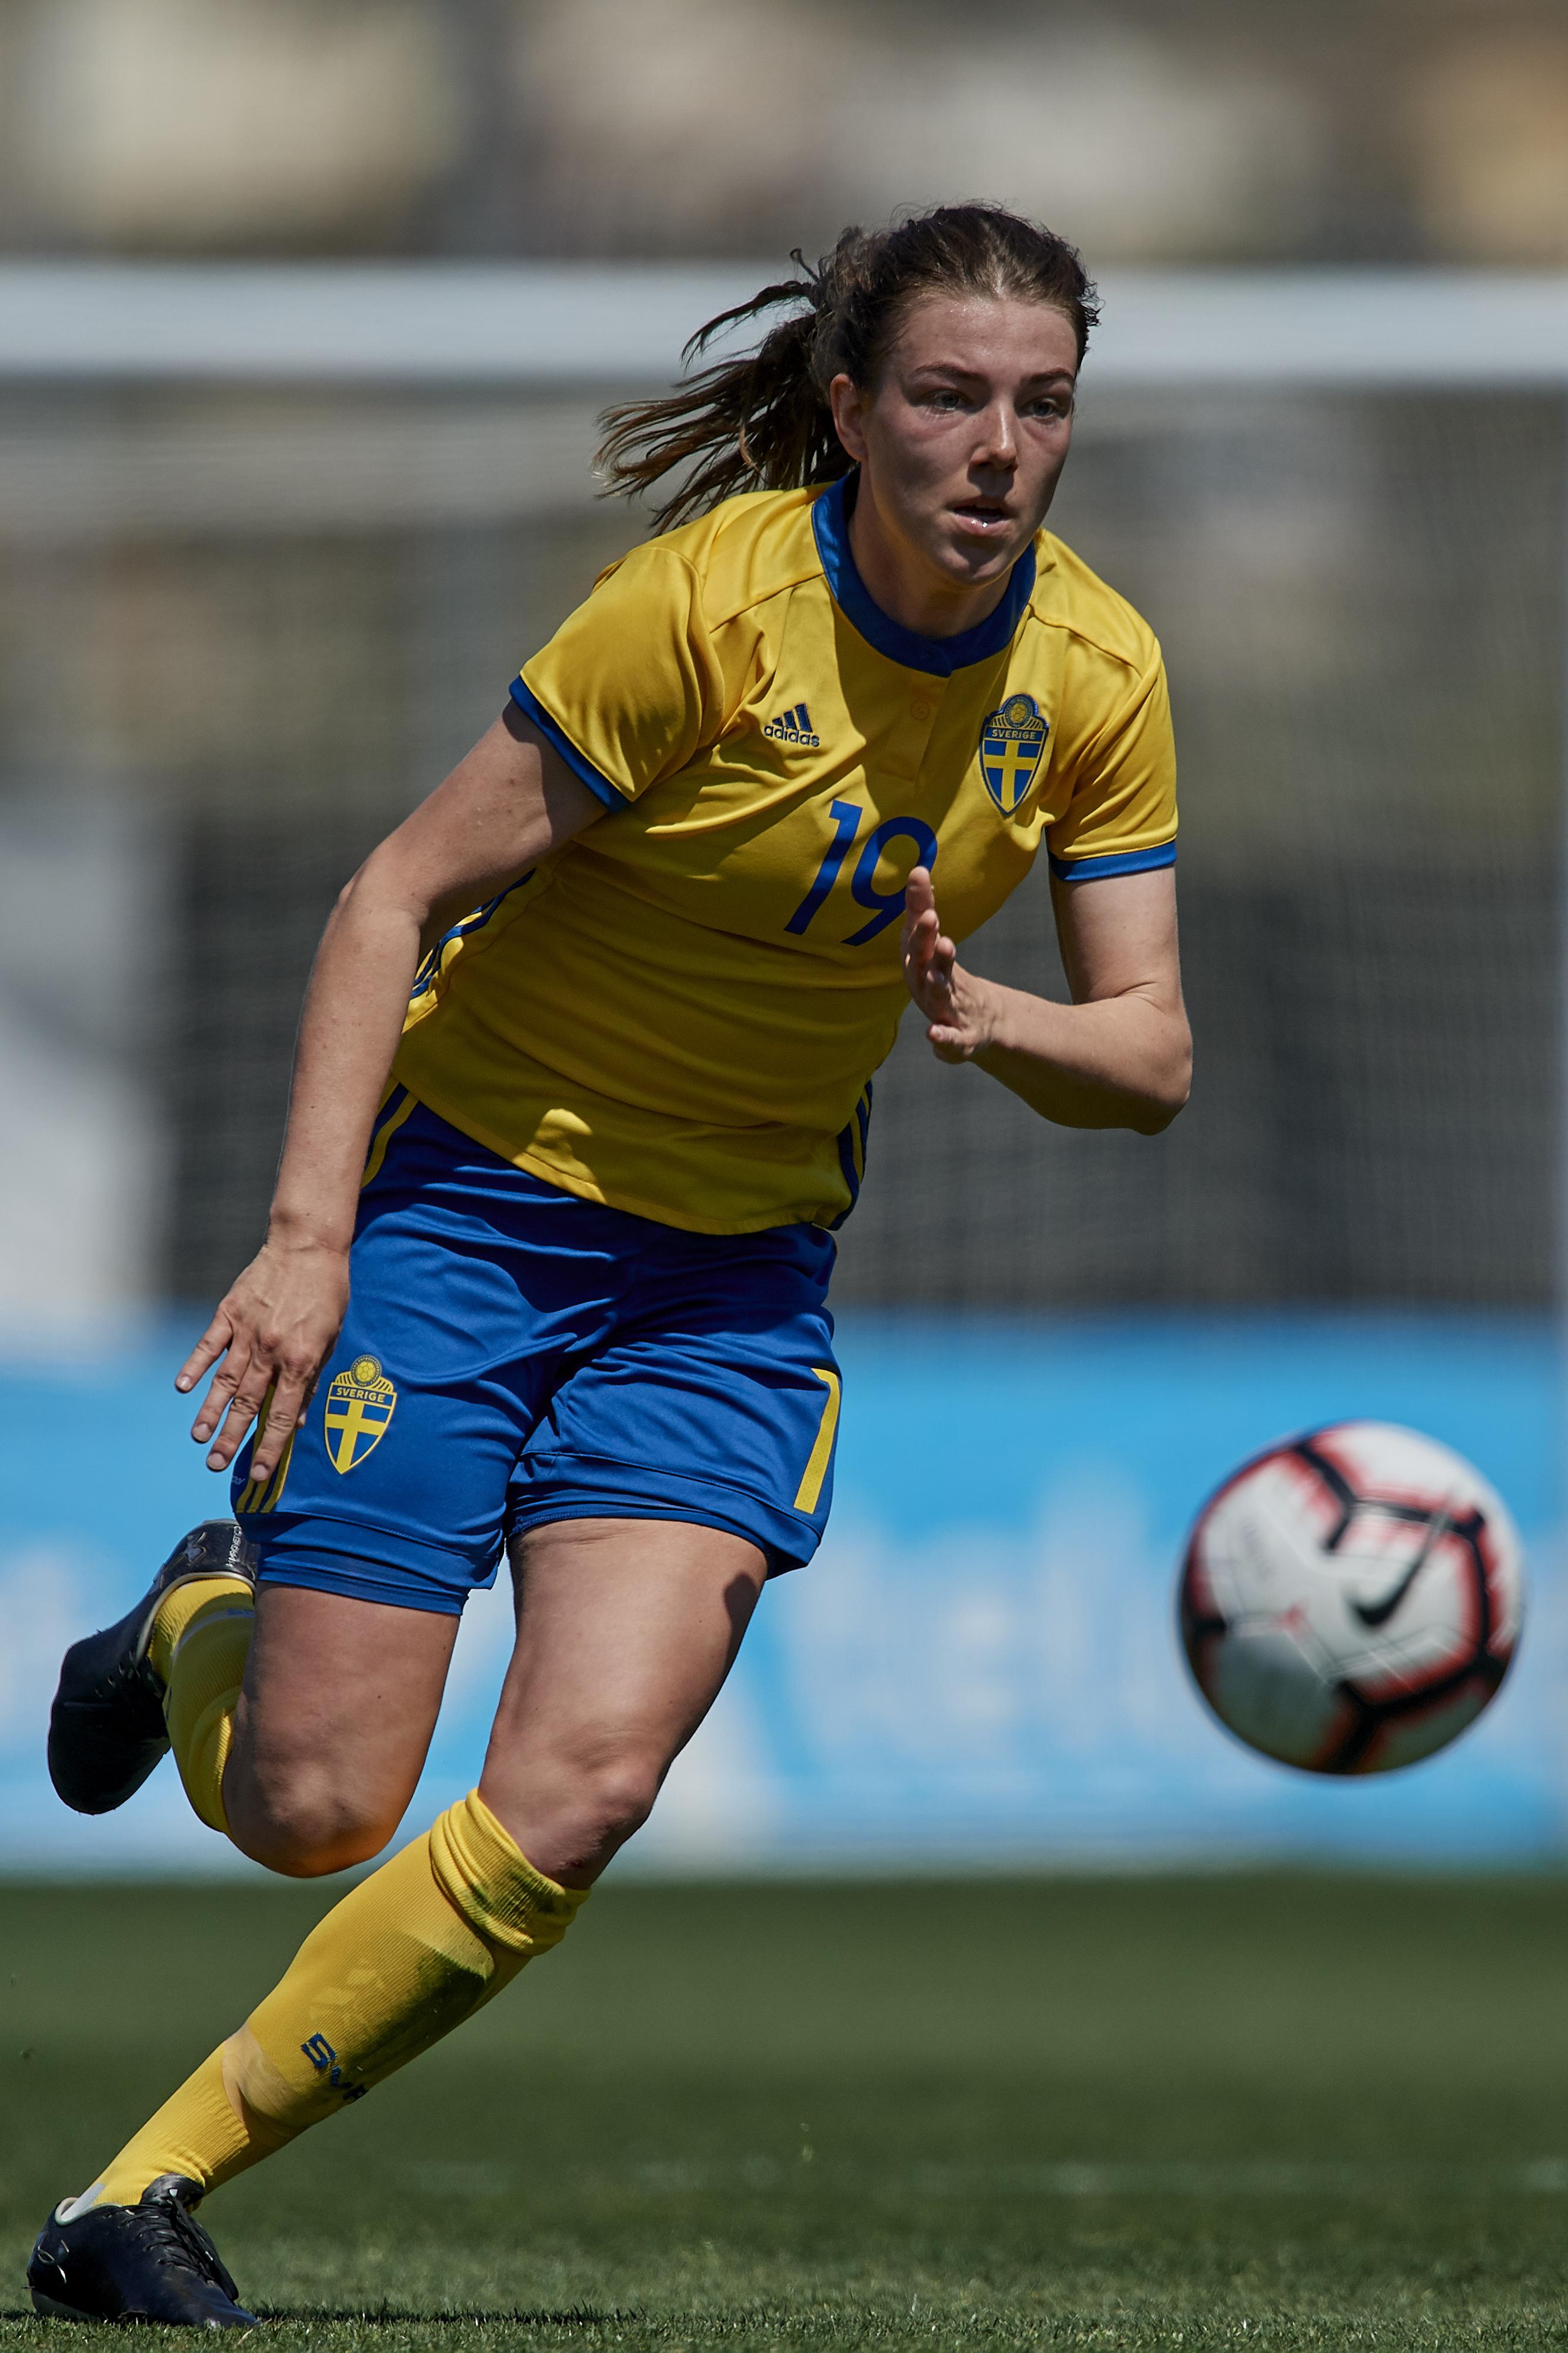 Sweden v USA - Women's U23 International Friendly